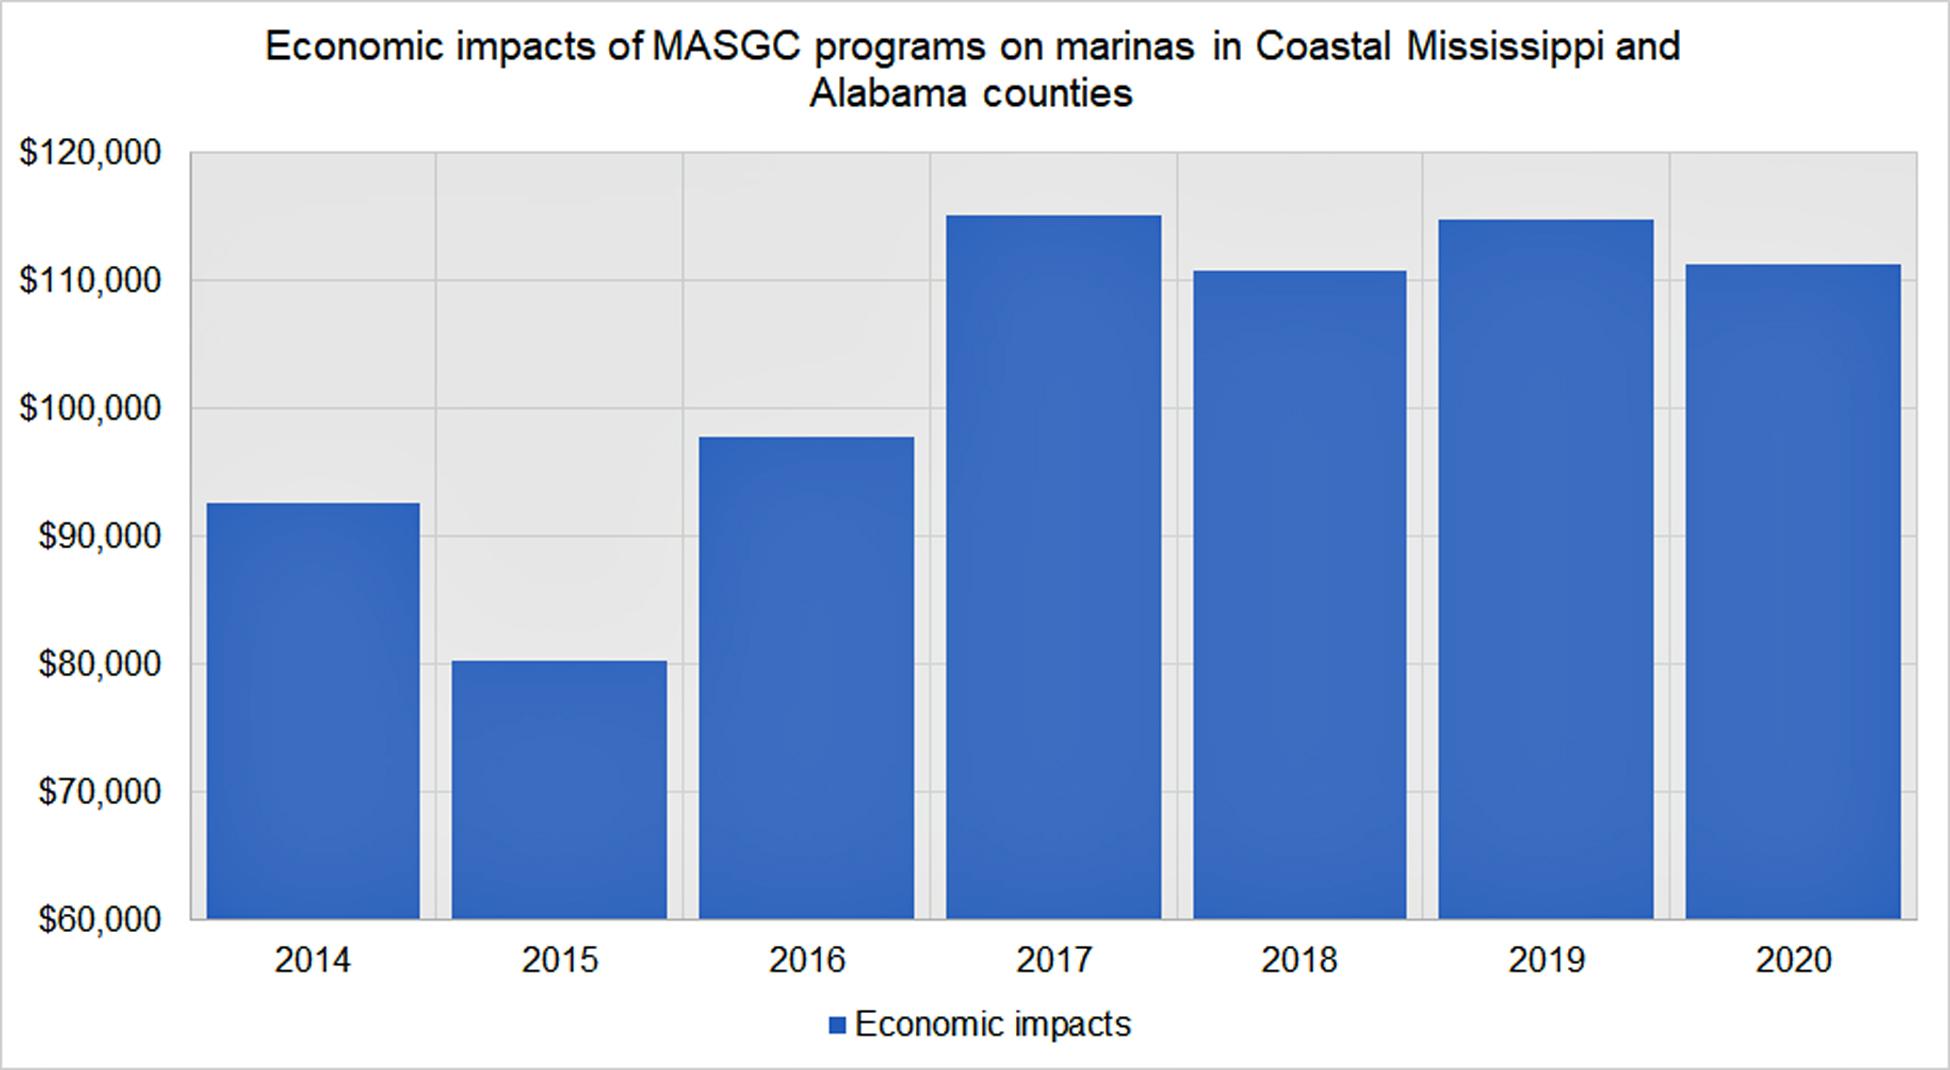 economic_impacts_of_masgc_programs_on_marinas_in_coastal_ms_and_al.jpg